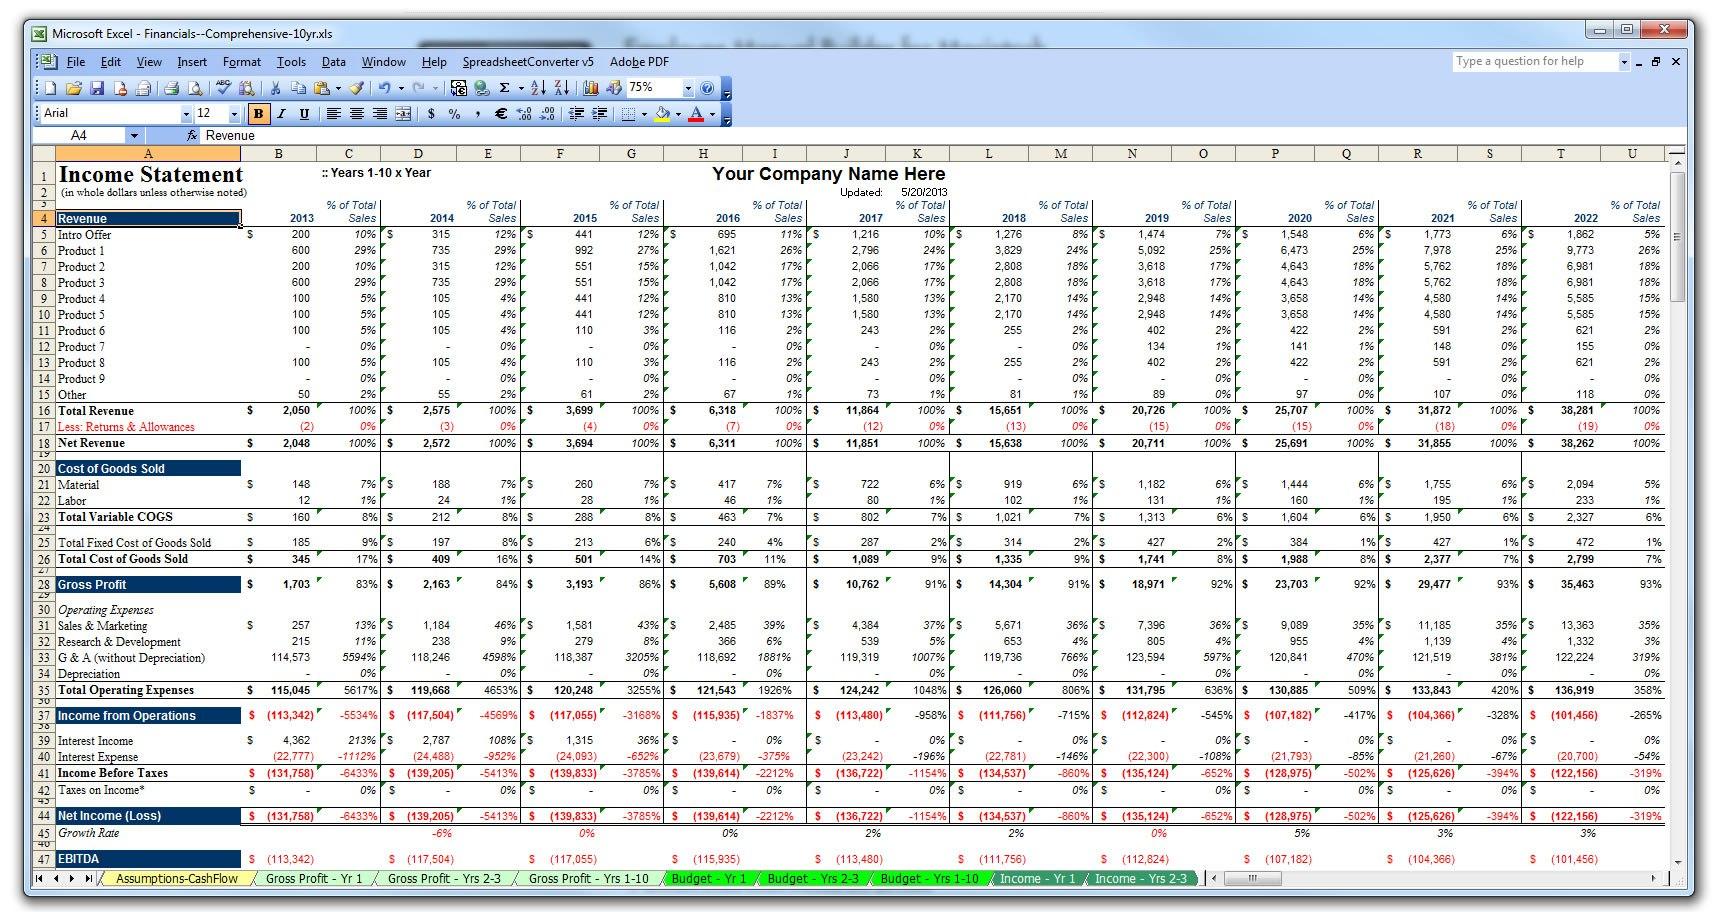 Sample Of Business Financial Plan Template Excel To Business Financial Plan Template Excel For Google Sheet